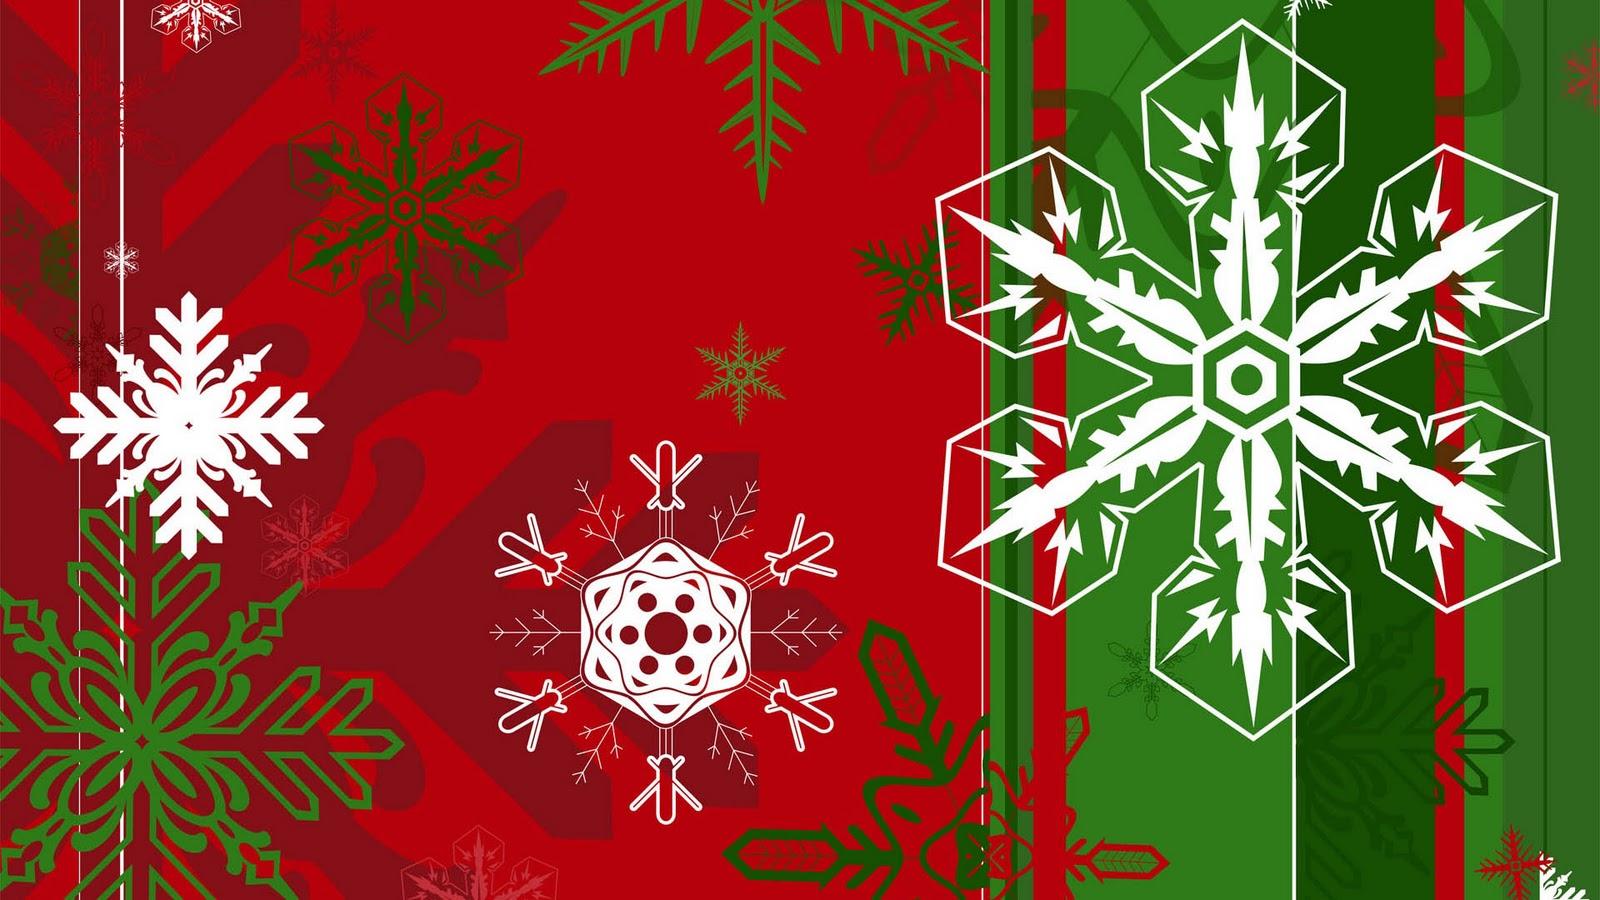 wallpapers christmas imagenes navidenos - photo #7